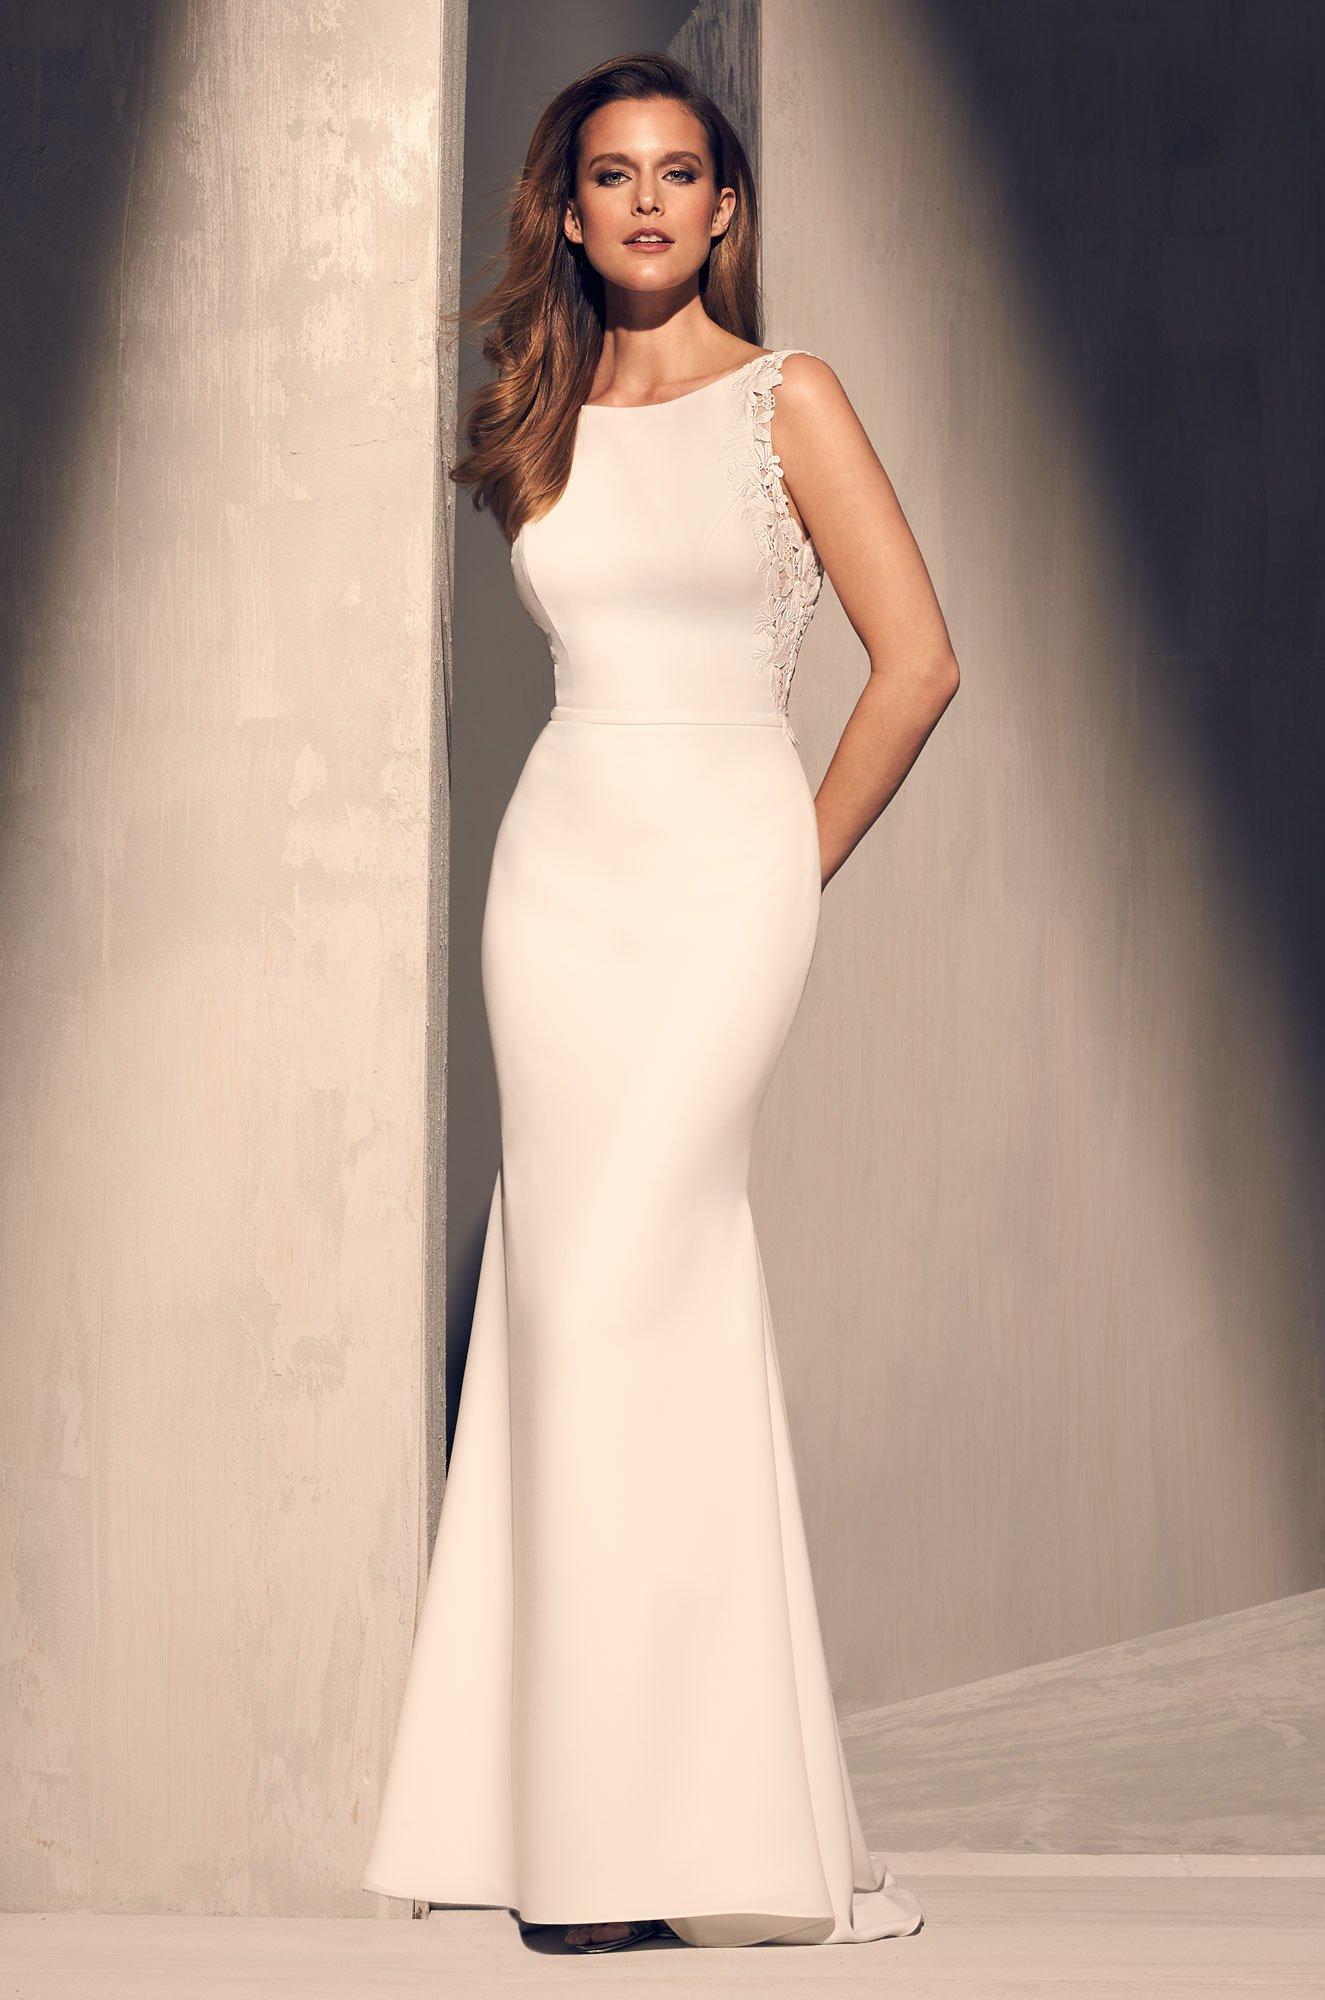 Crêpe Boat Neckline Wedding Dress - Style #2206   Mikaella Bridal